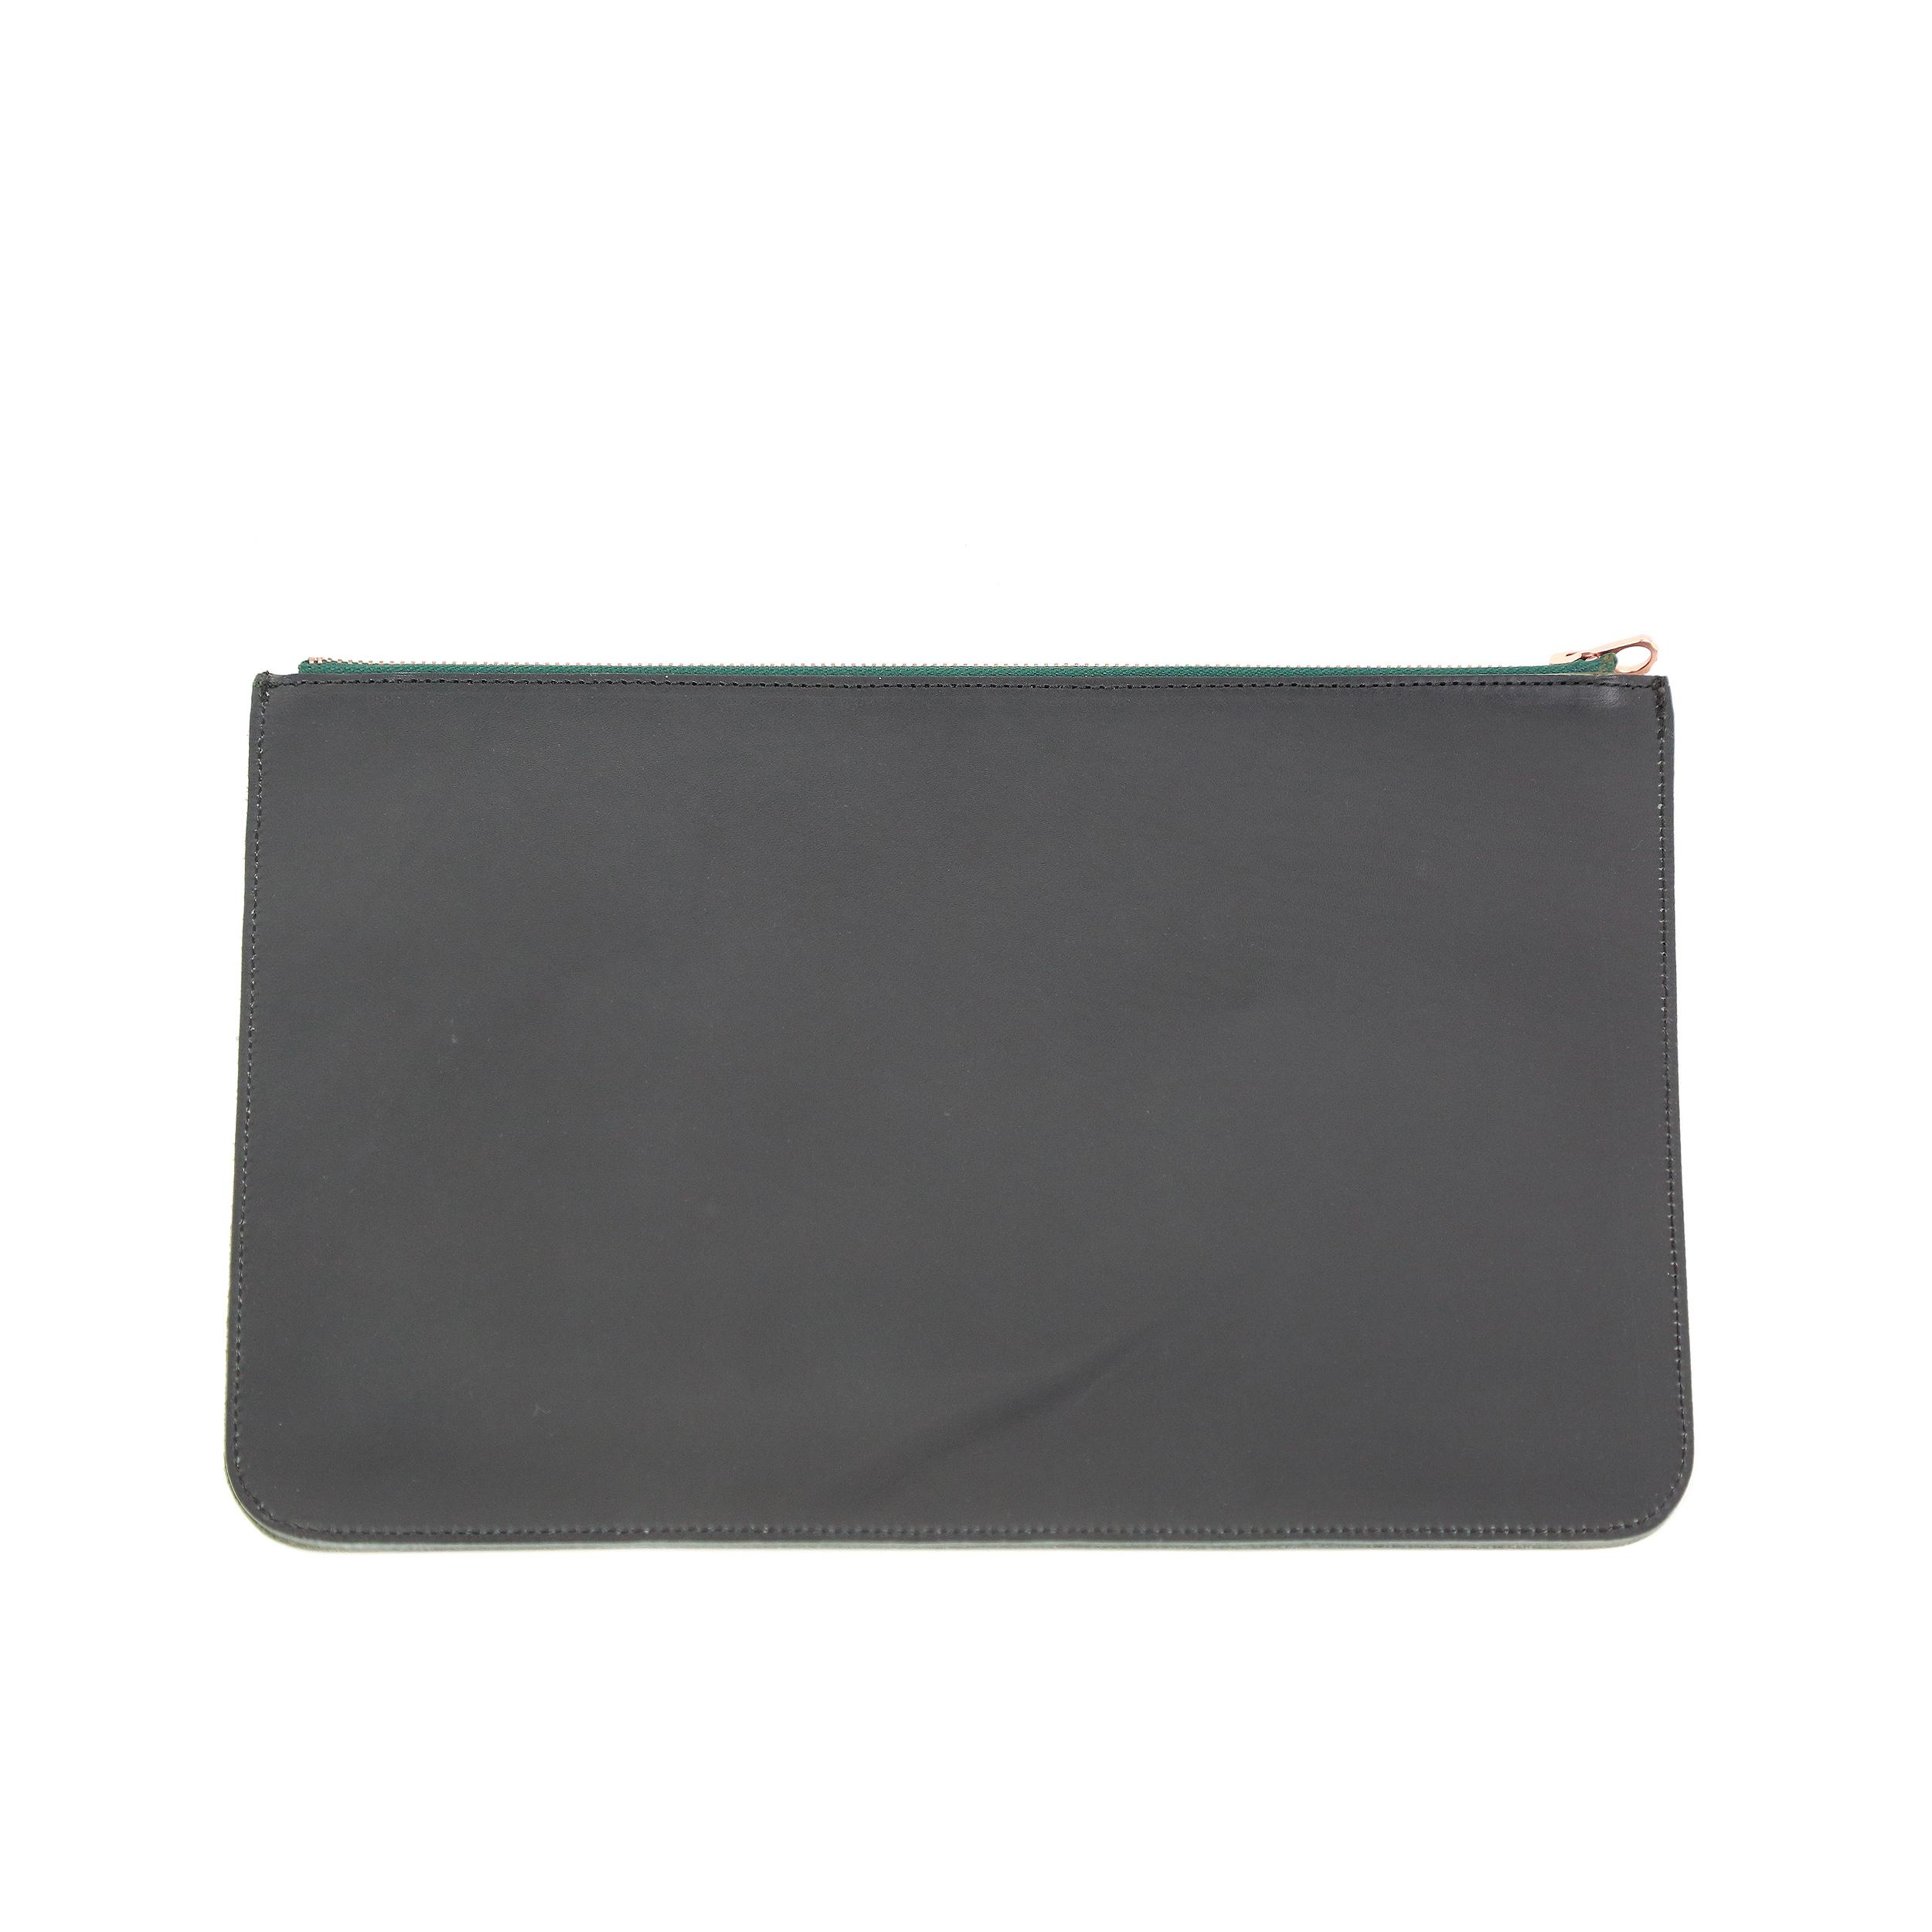 BROMO Black Green Zip-4